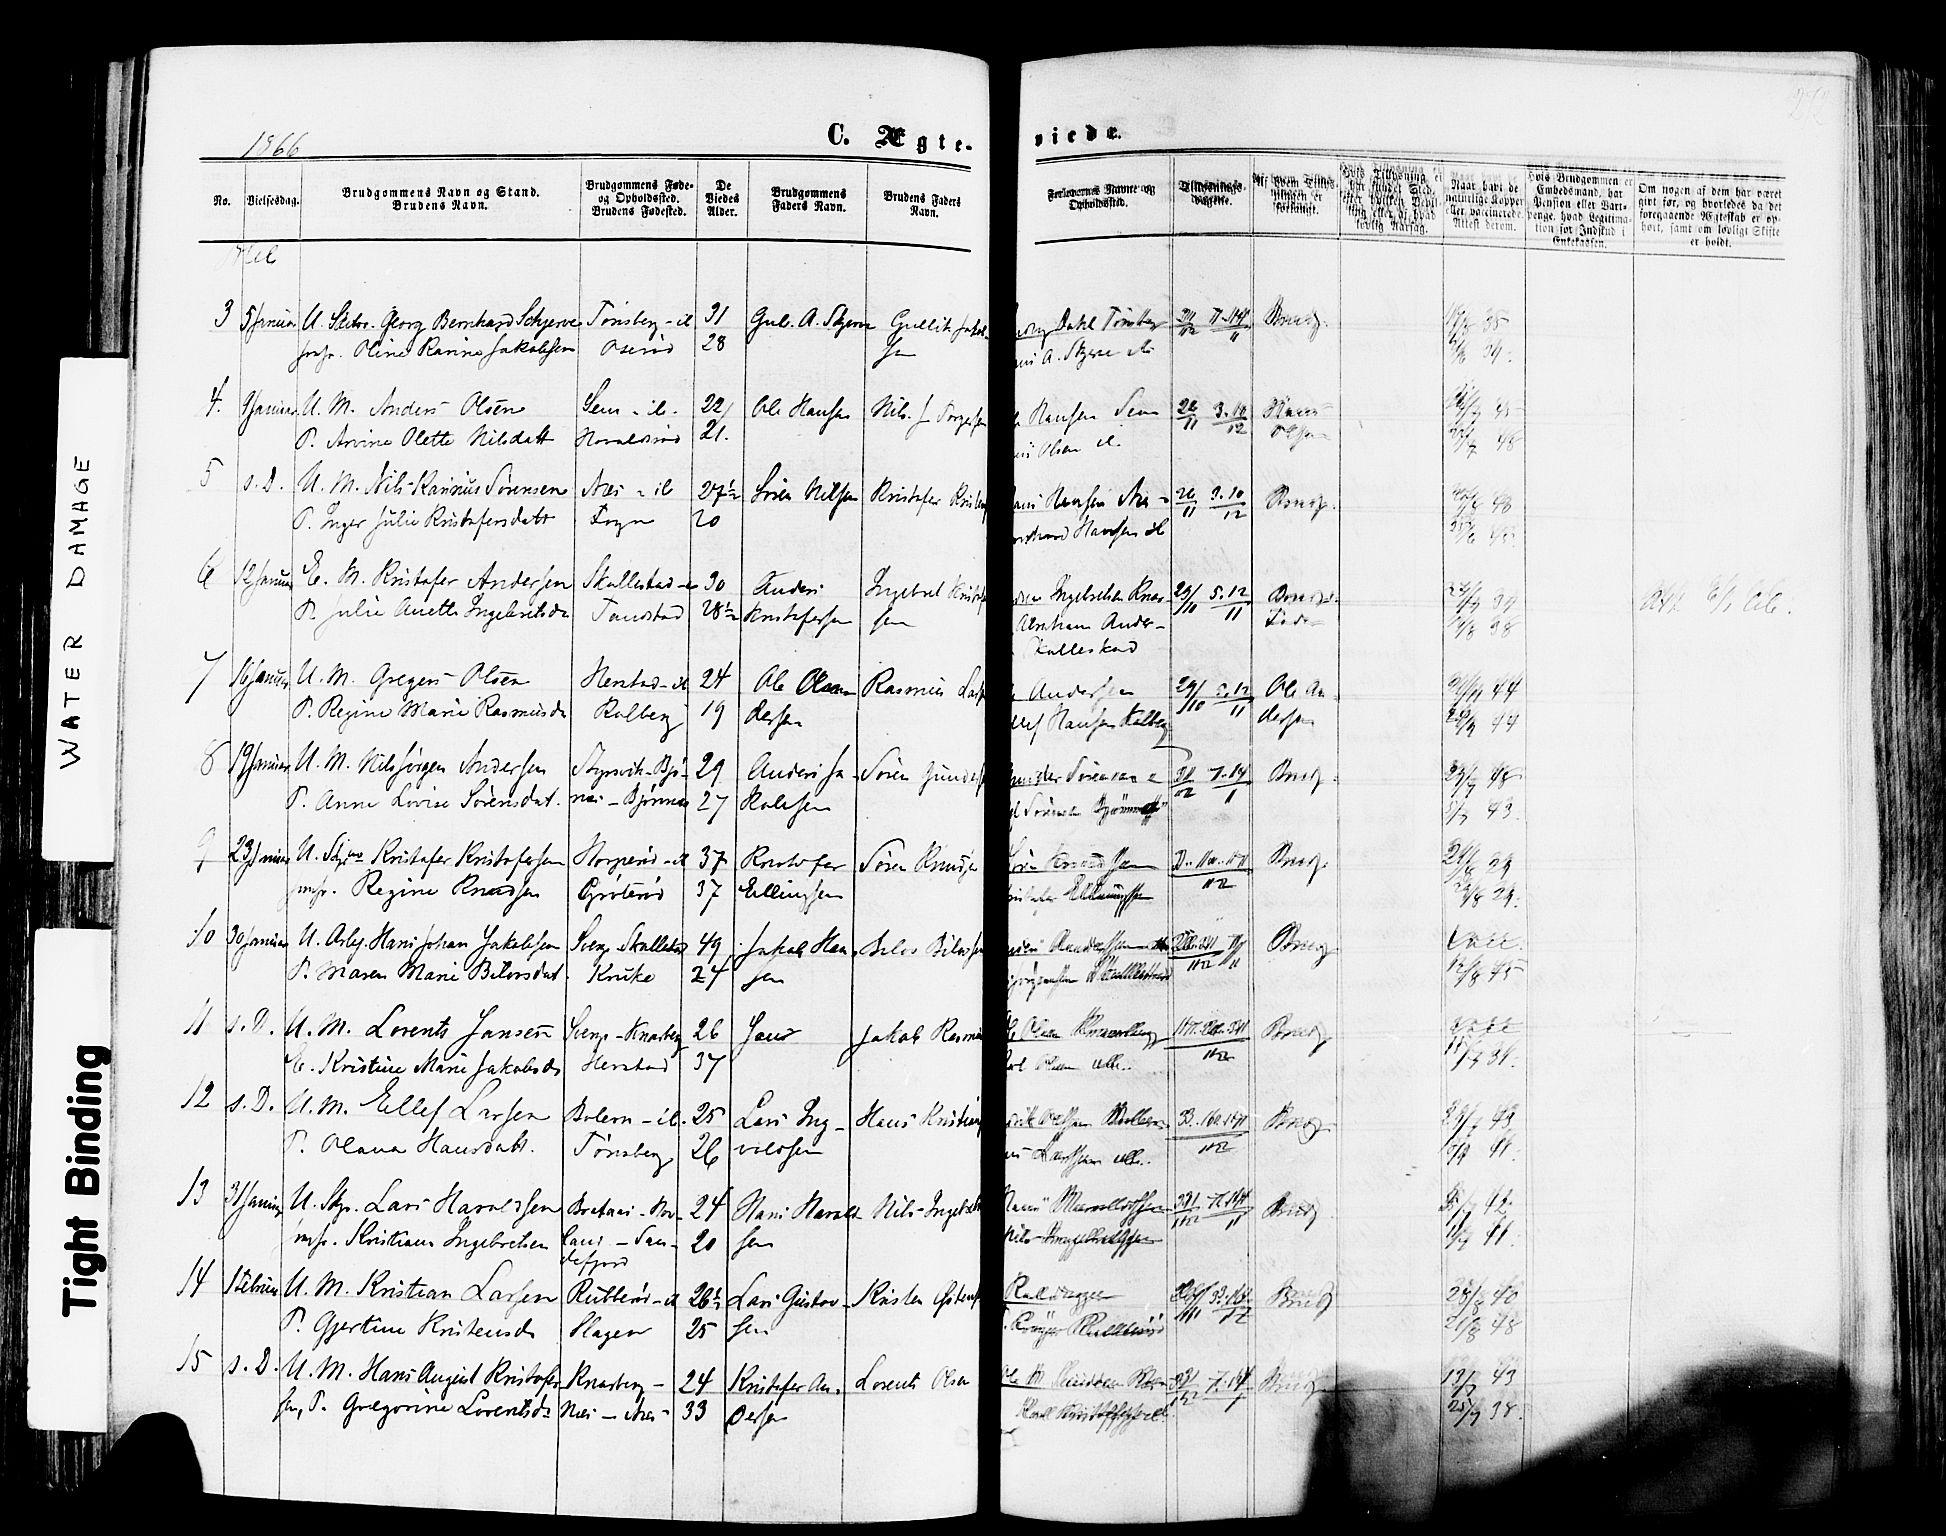 SAKO, Nøtterøy kirkebøker, F/Fa/L0007: Ministerialbok nr. I 7, 1865-1877, s. 272